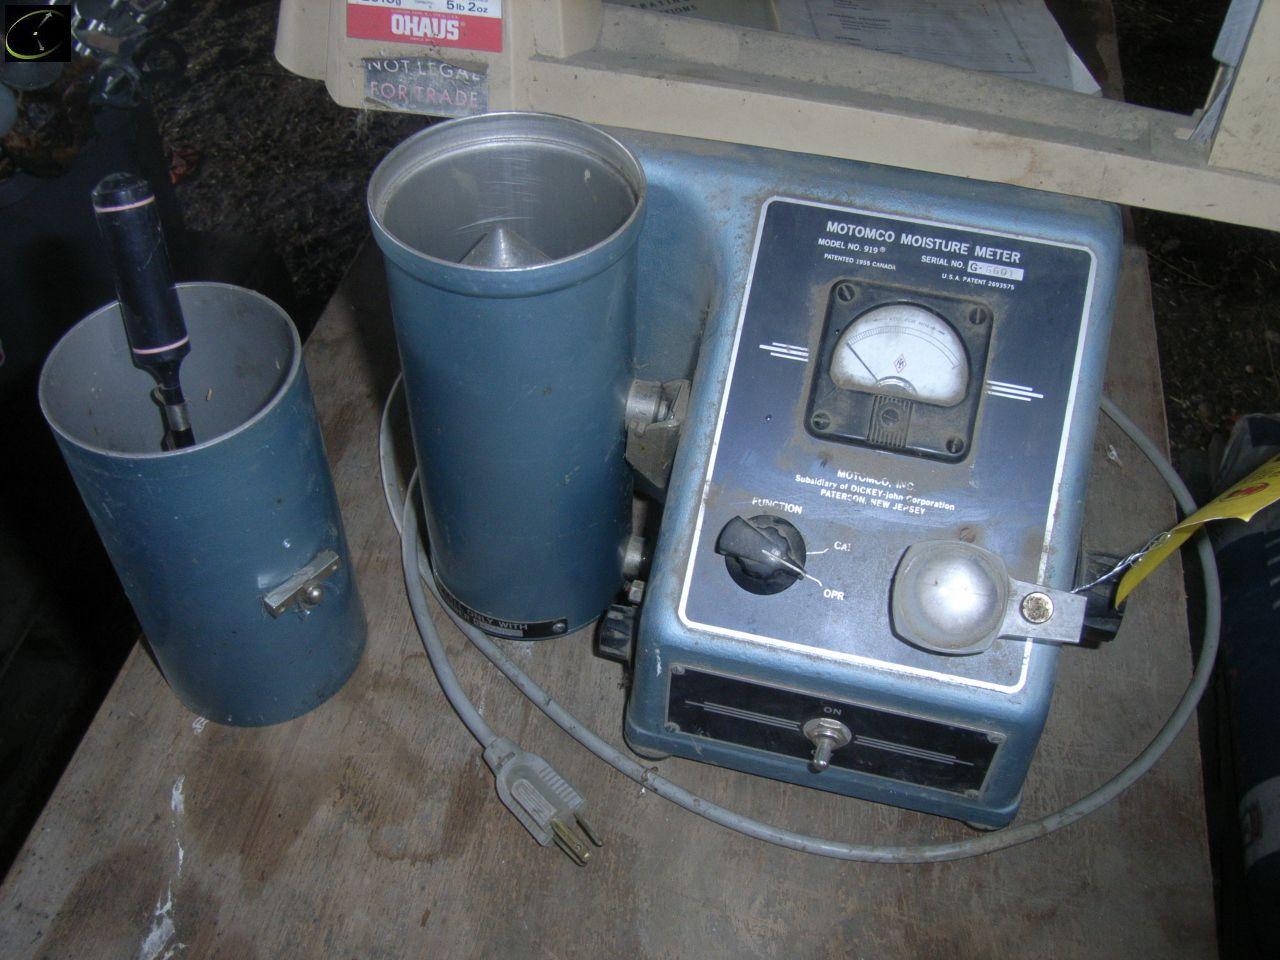 motomco moisture meter 919 manual